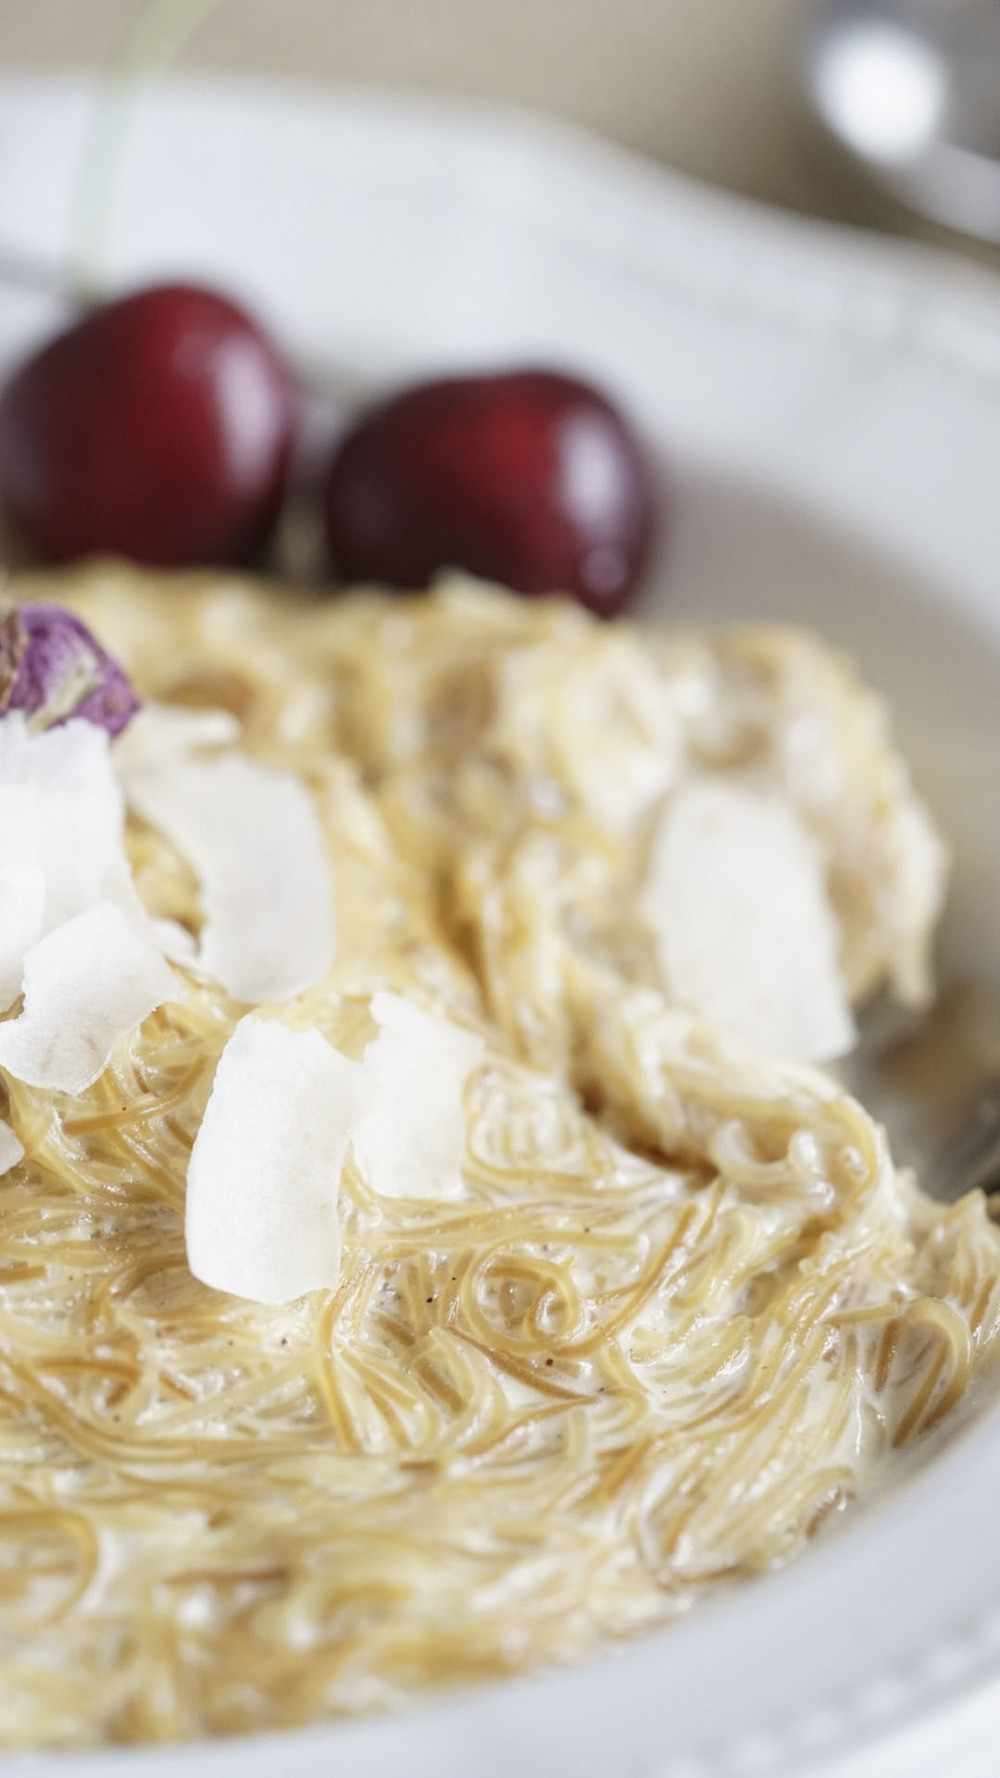 Shemai Sweet Vermicelli & Saffron Pudding_1506_1.jpg